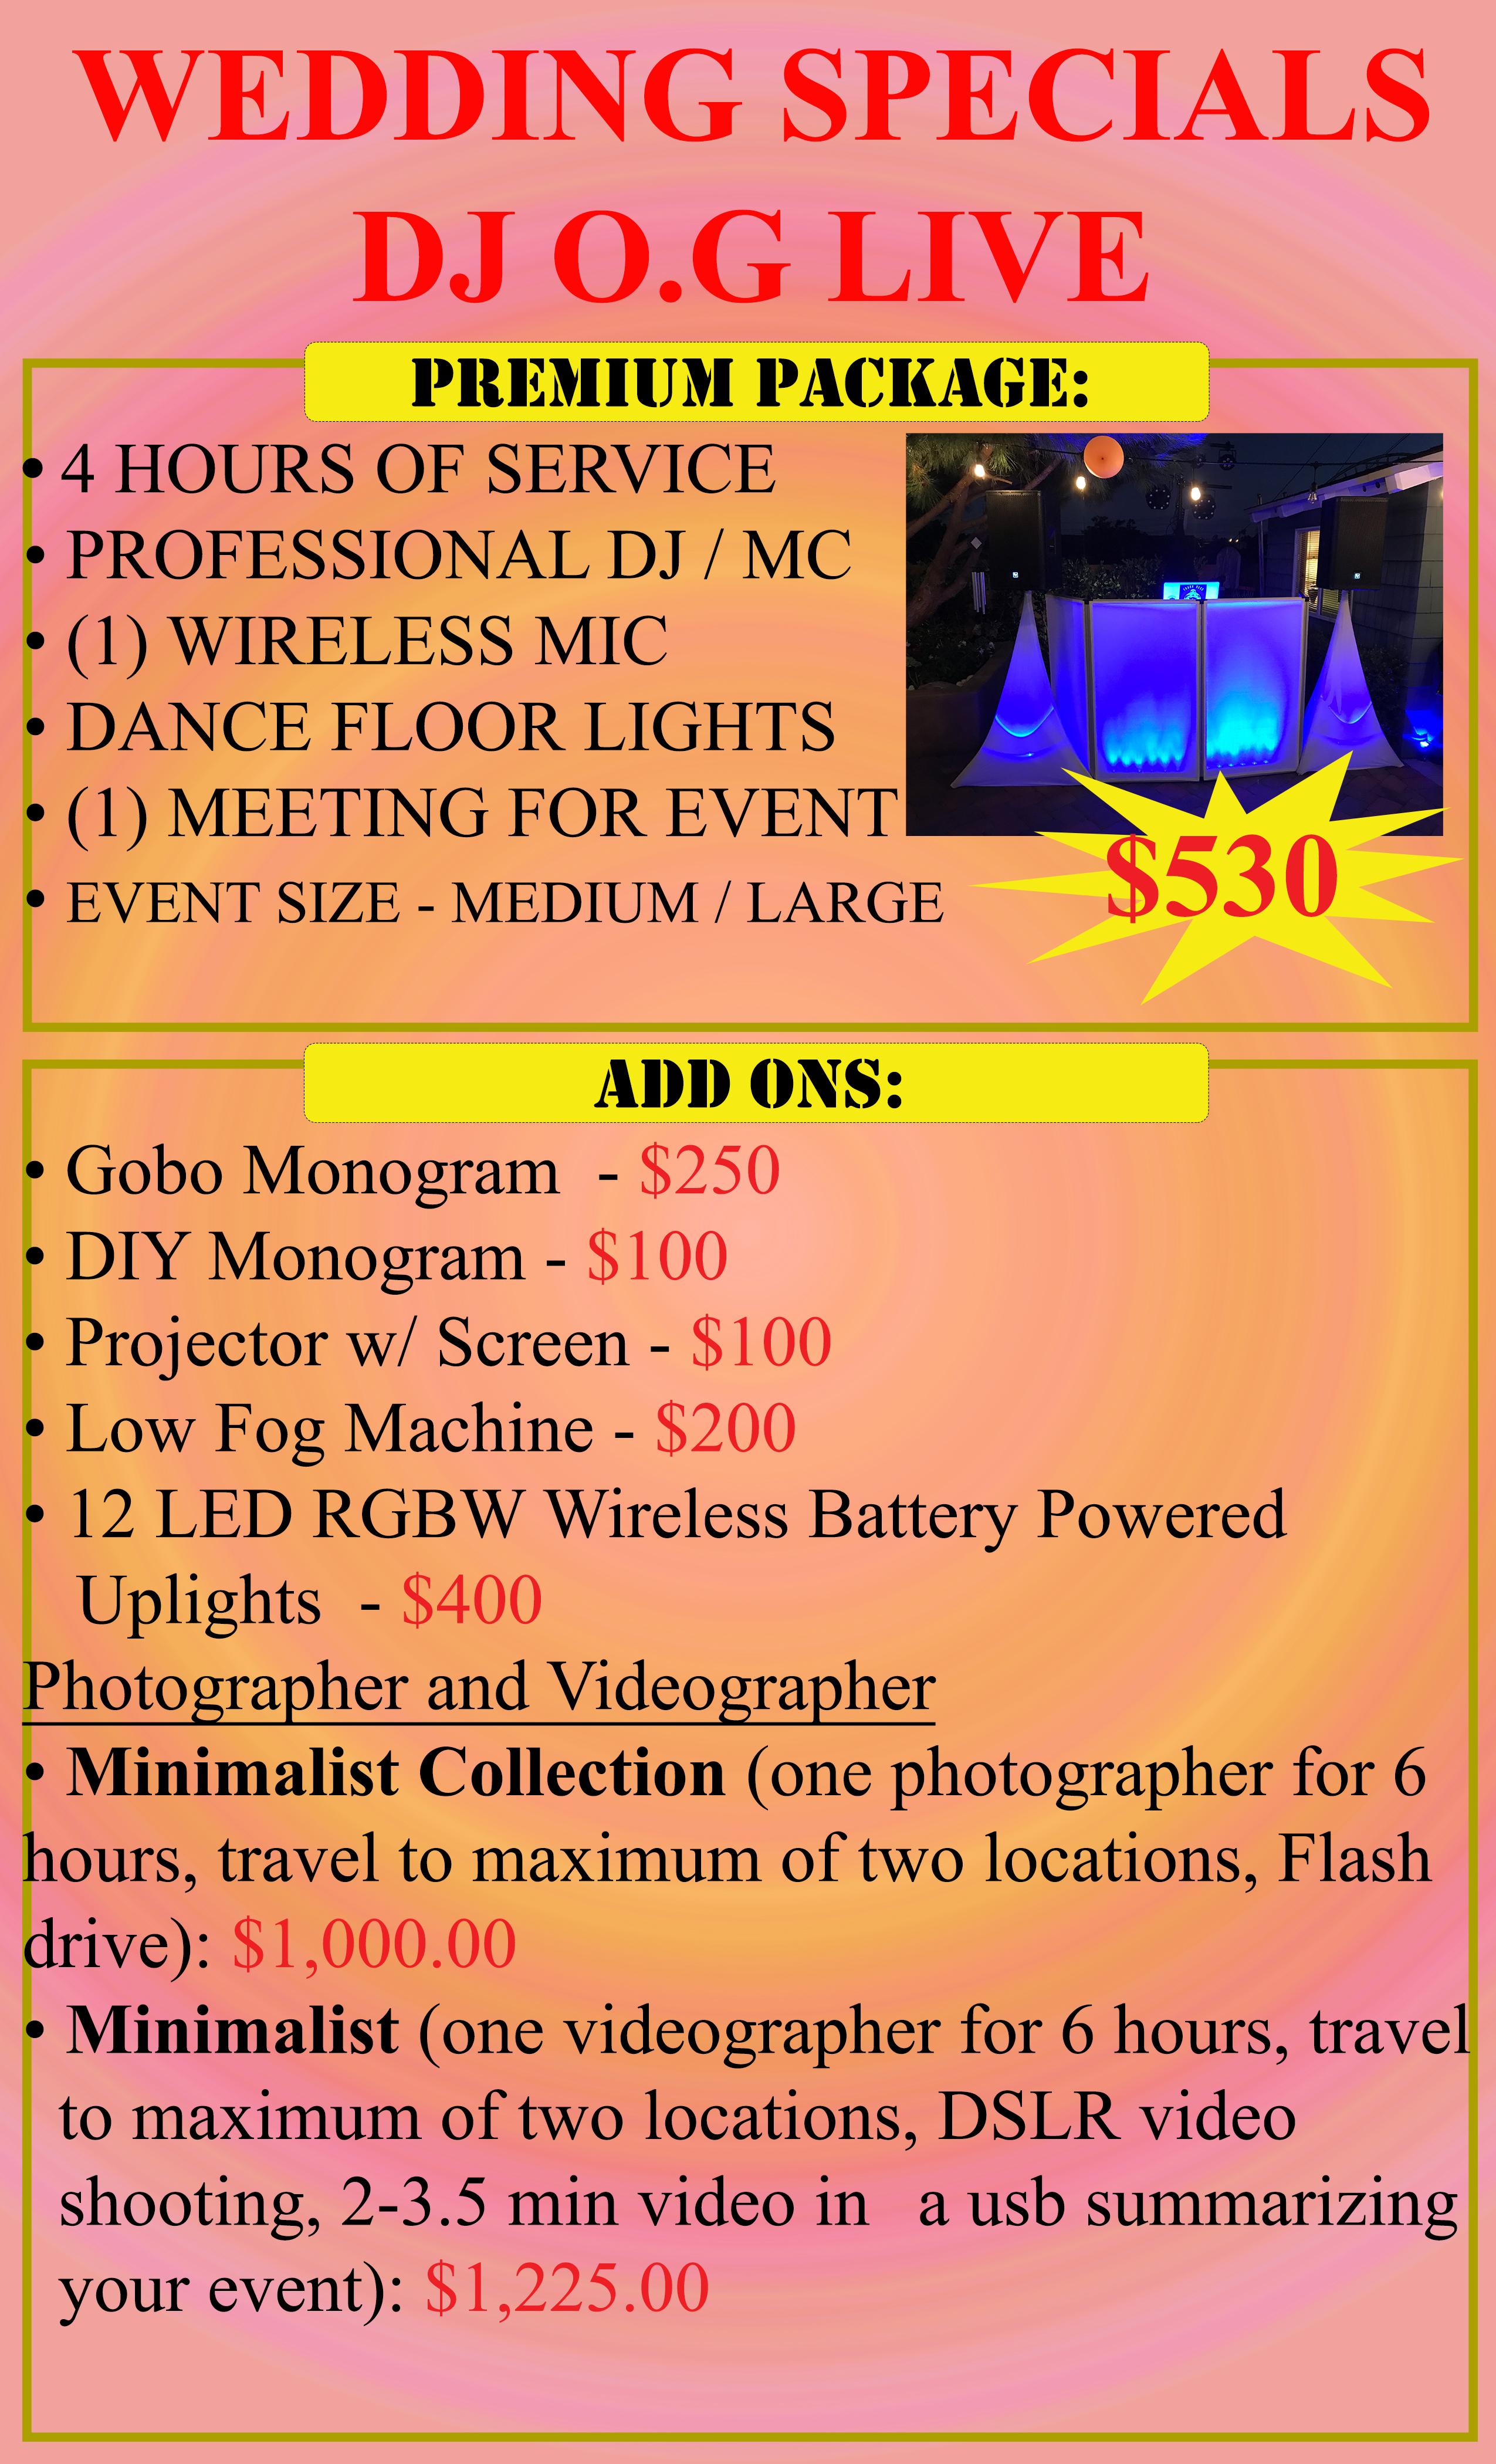 Wedding Special DJ Premium Package copy